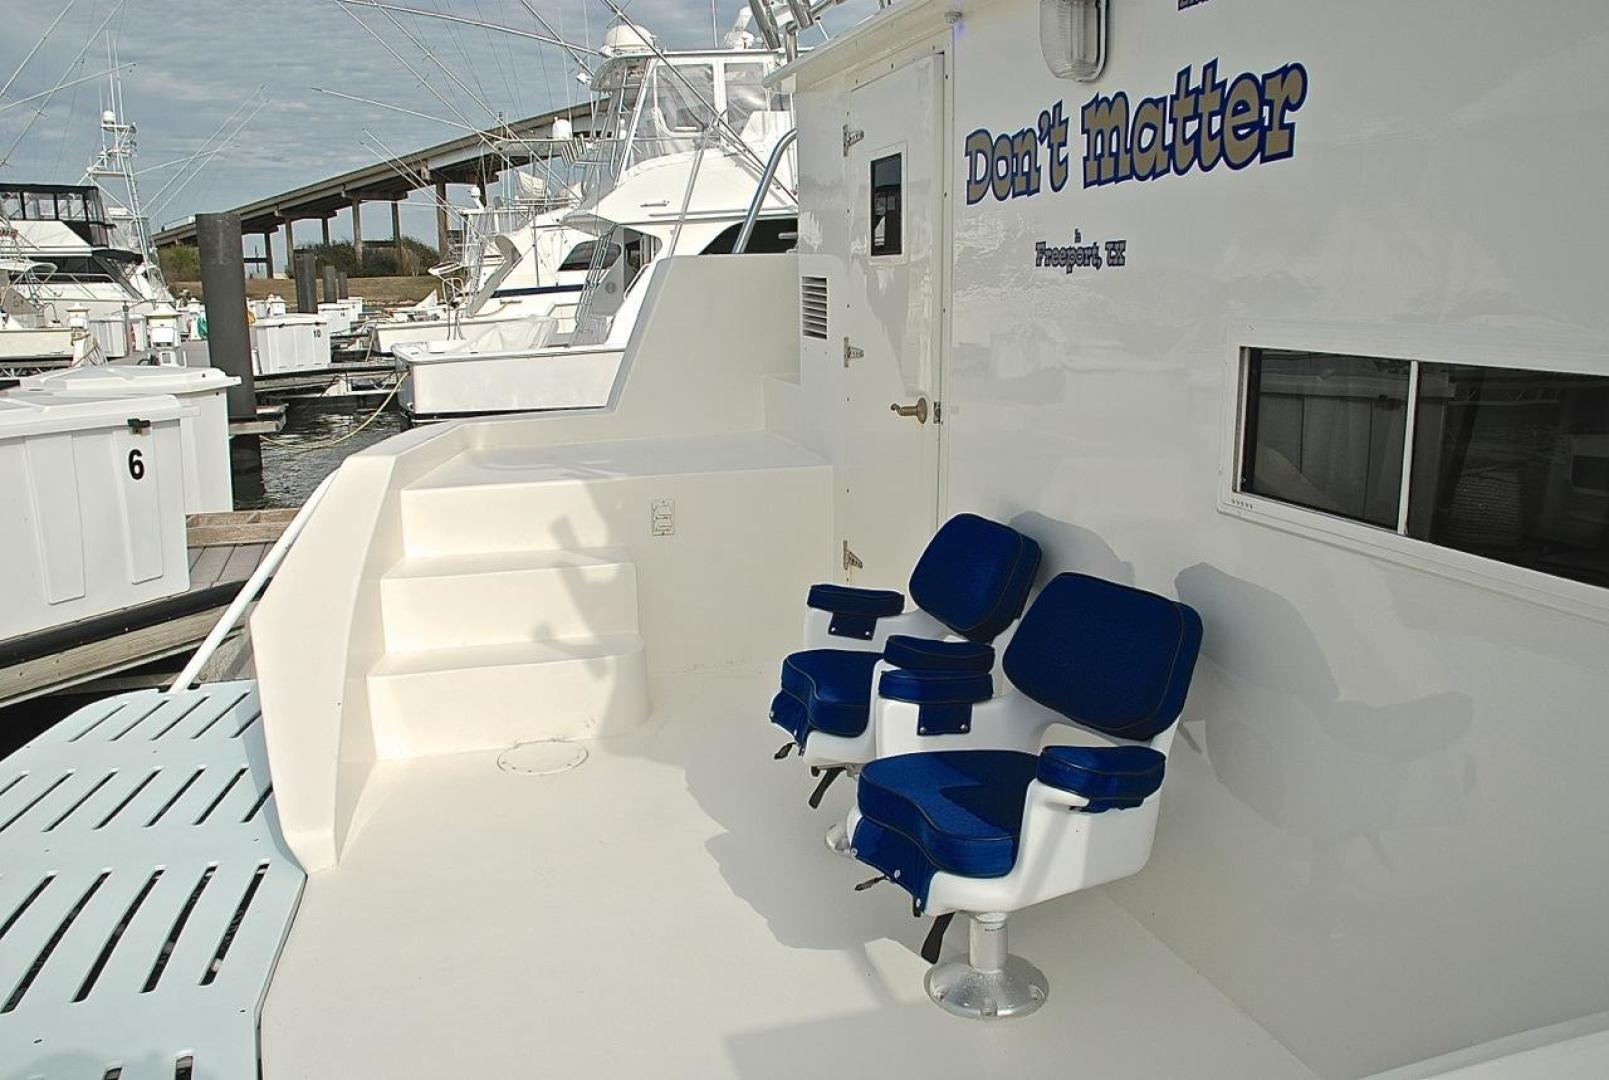 Infinity-Cockpit Motor Yacht 2001-Dont Matter Houston-Texas-United States-Cockpit-1005574 | Thumbnail